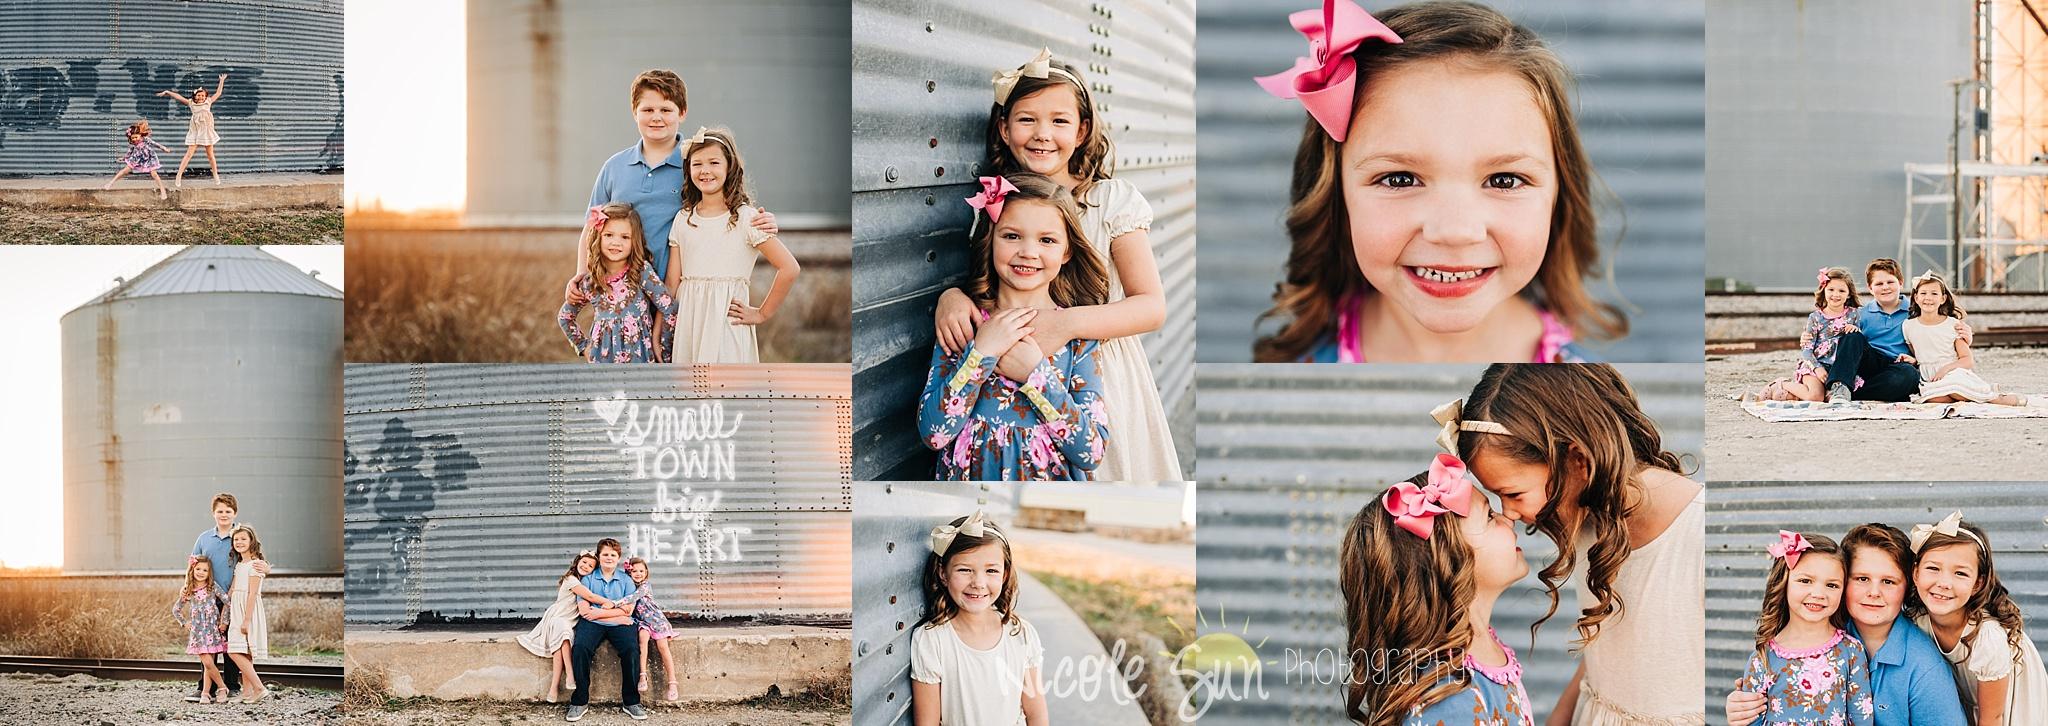 prosperfamilyphotography.jpg